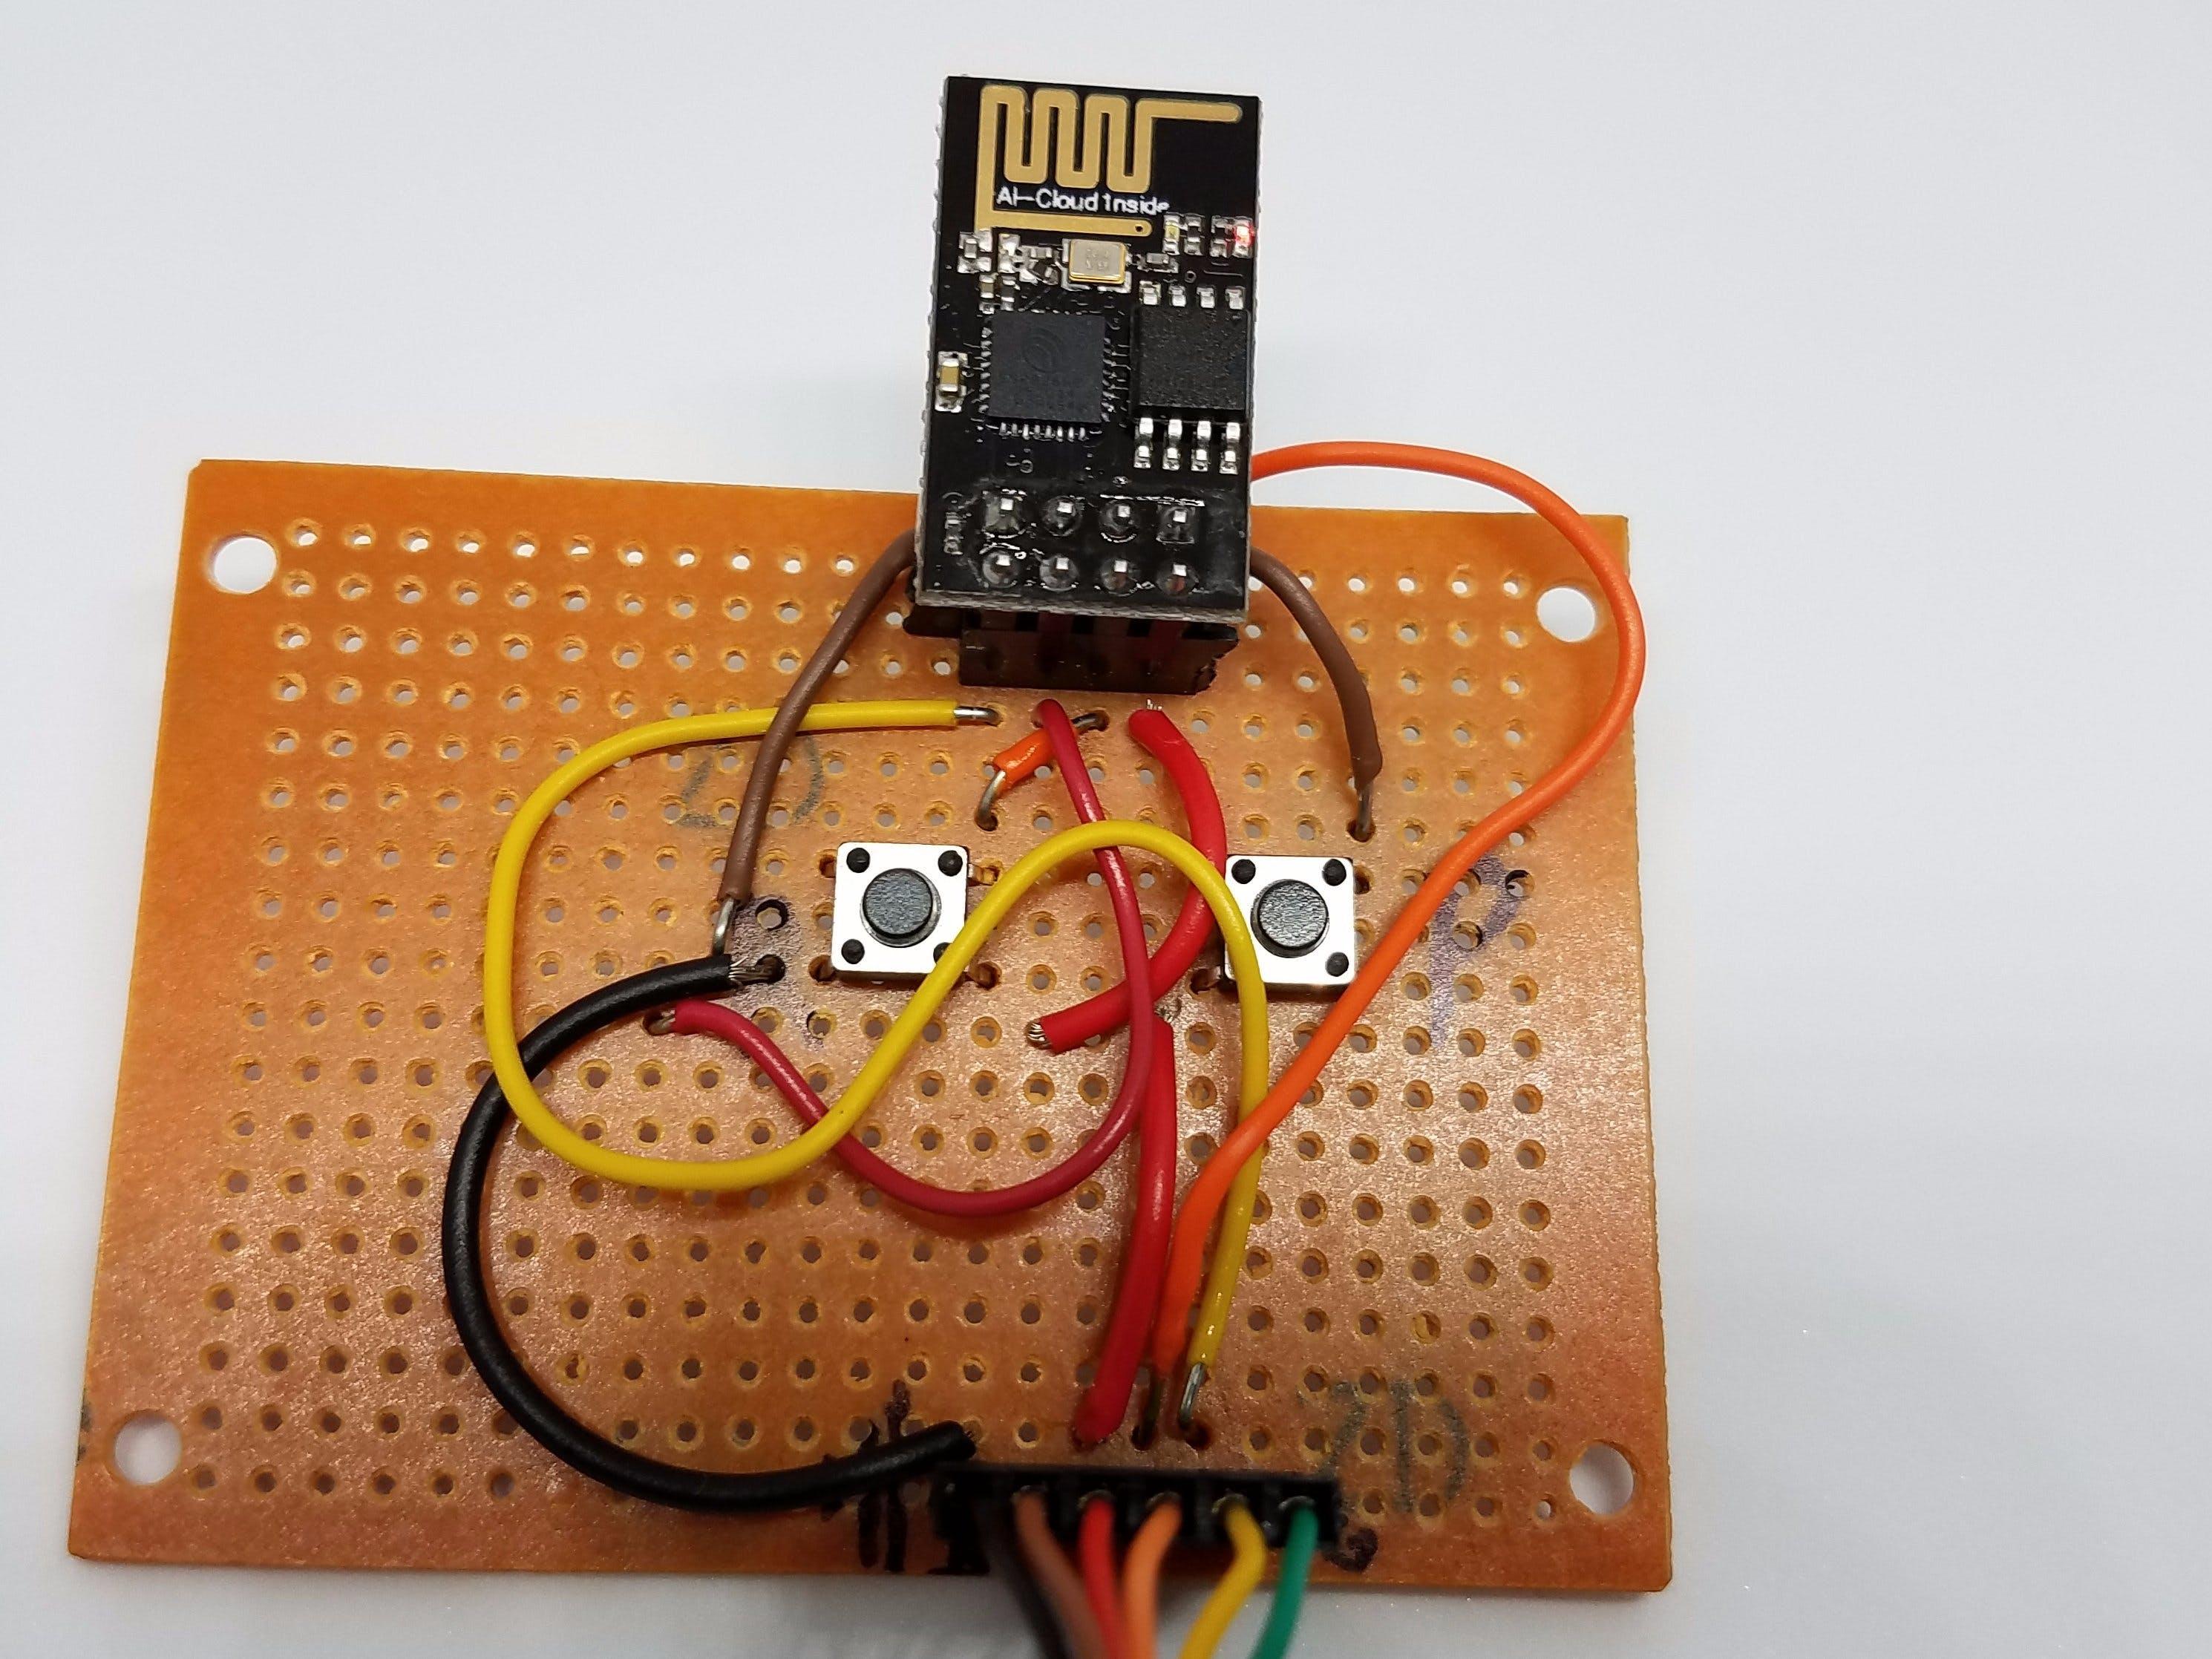 Less tiny ESP8266 programming jig